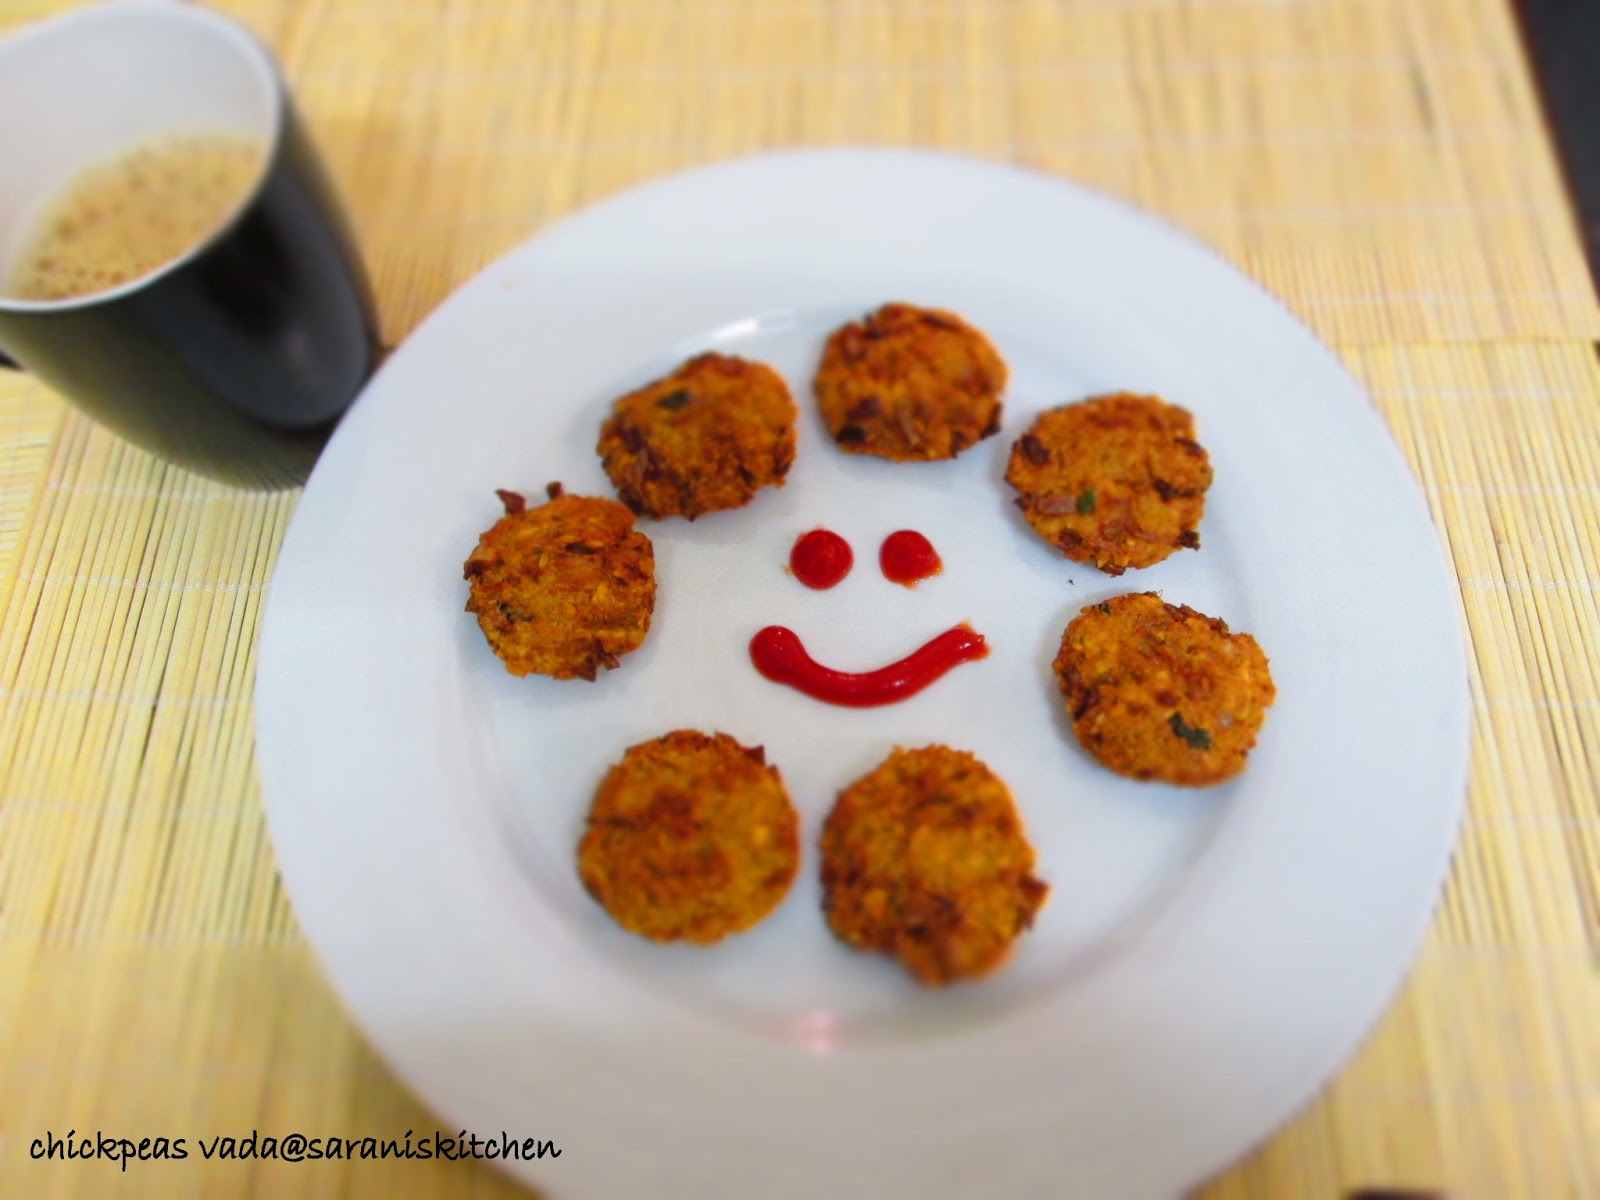 SARANI'S KITCHEN: Chickpeas vada - Good Tea time snack